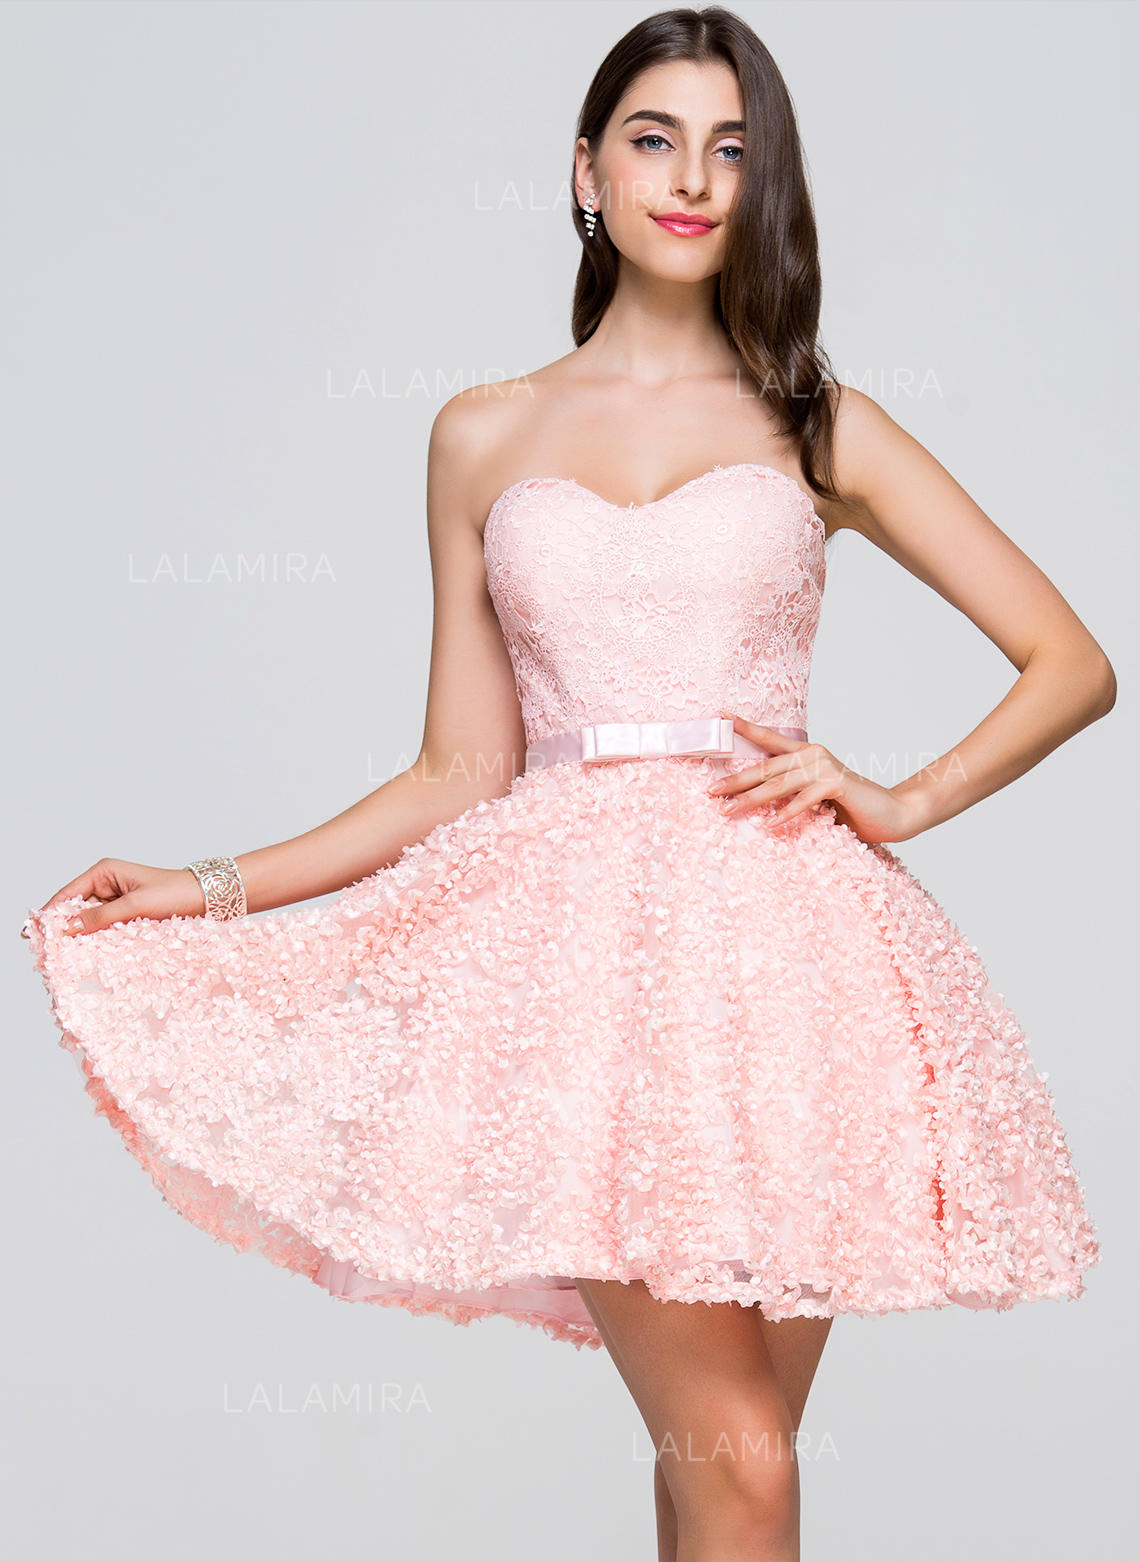 a163aeb9459761 2019 New Lace Homecoming Dresses A-Line/Princess Short/Mini Sweetheart  Sleeveless (. Loading zoom